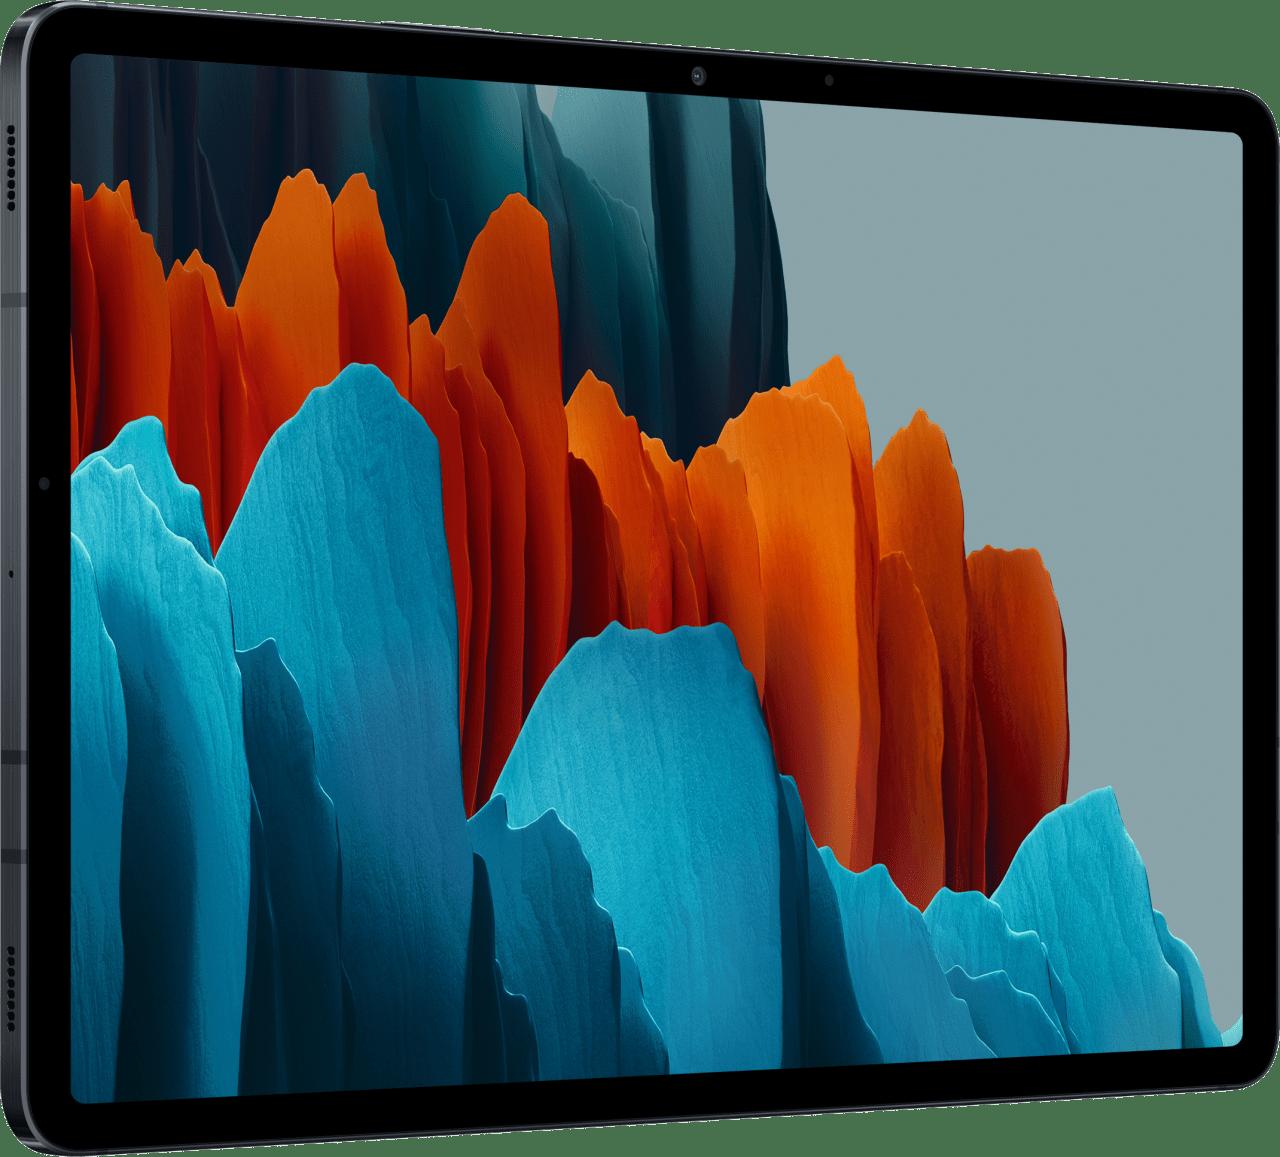 Schwarz Samsung Tablet Galaxy Tab S7 (2020) - 4G - Android™ 10 - 128GB.5